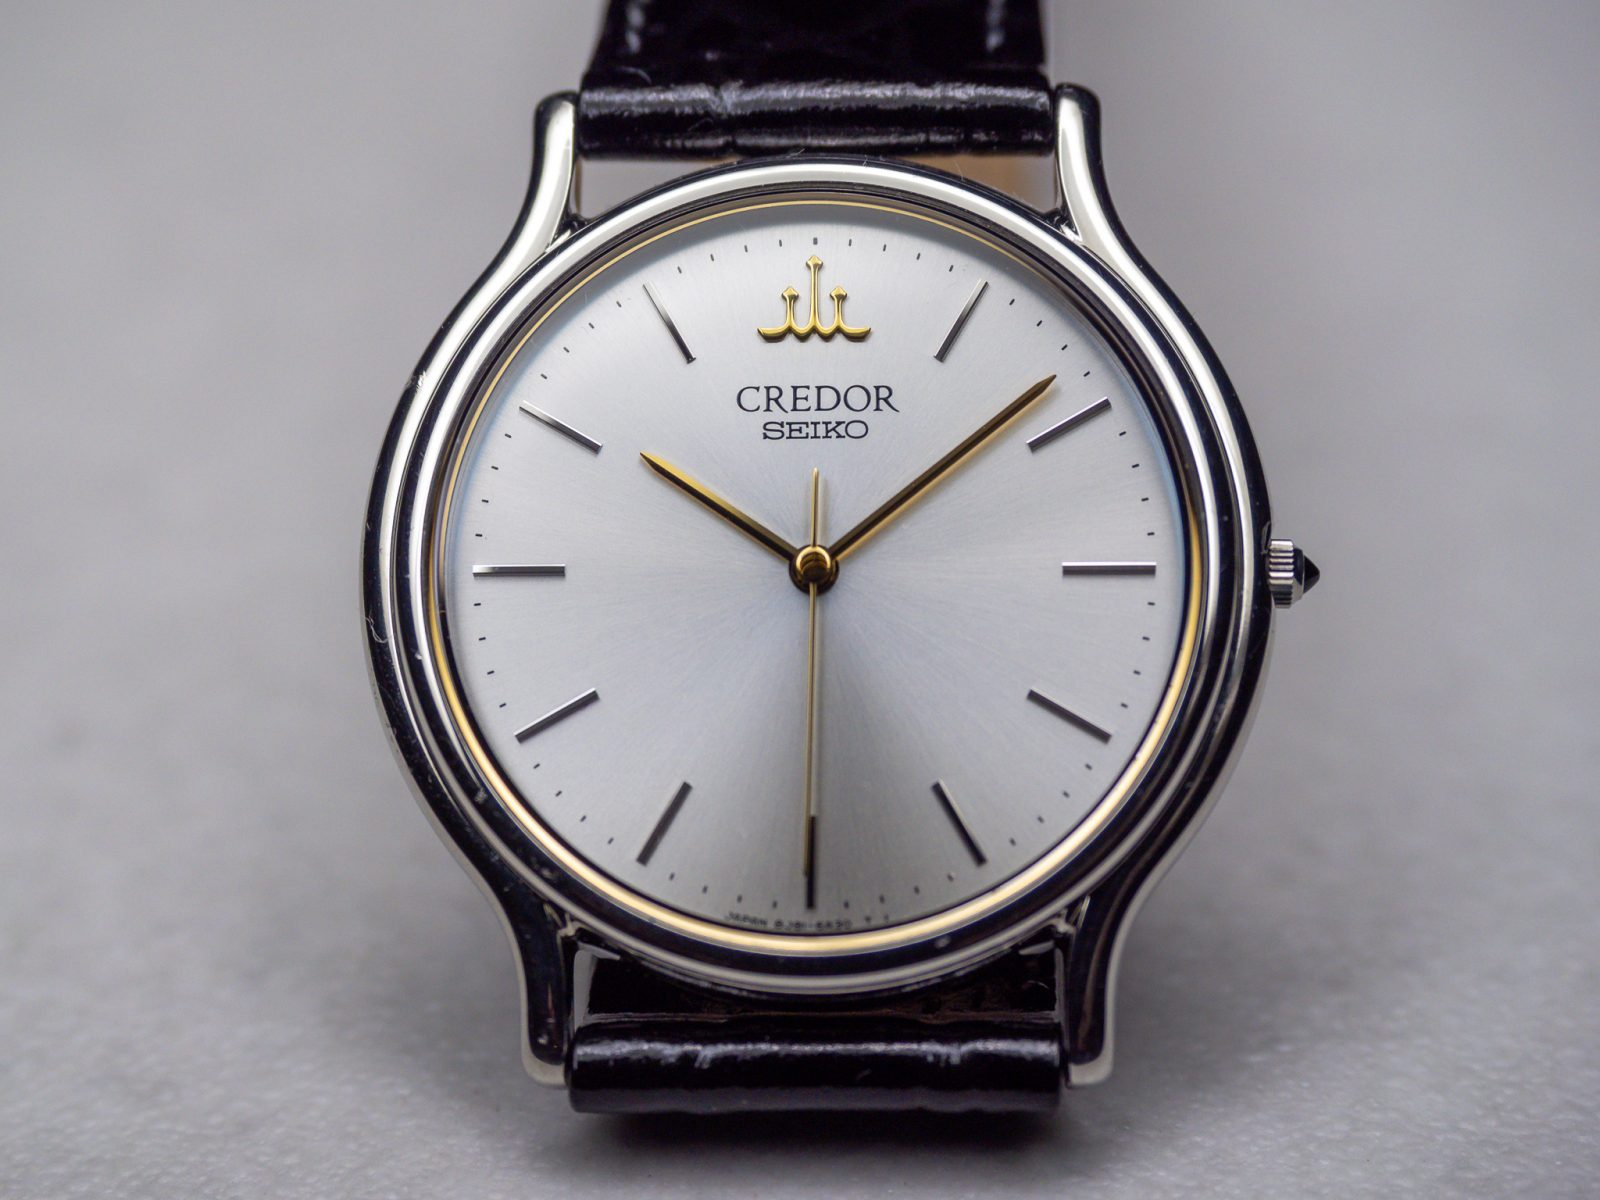 Seiko Credor 8J81